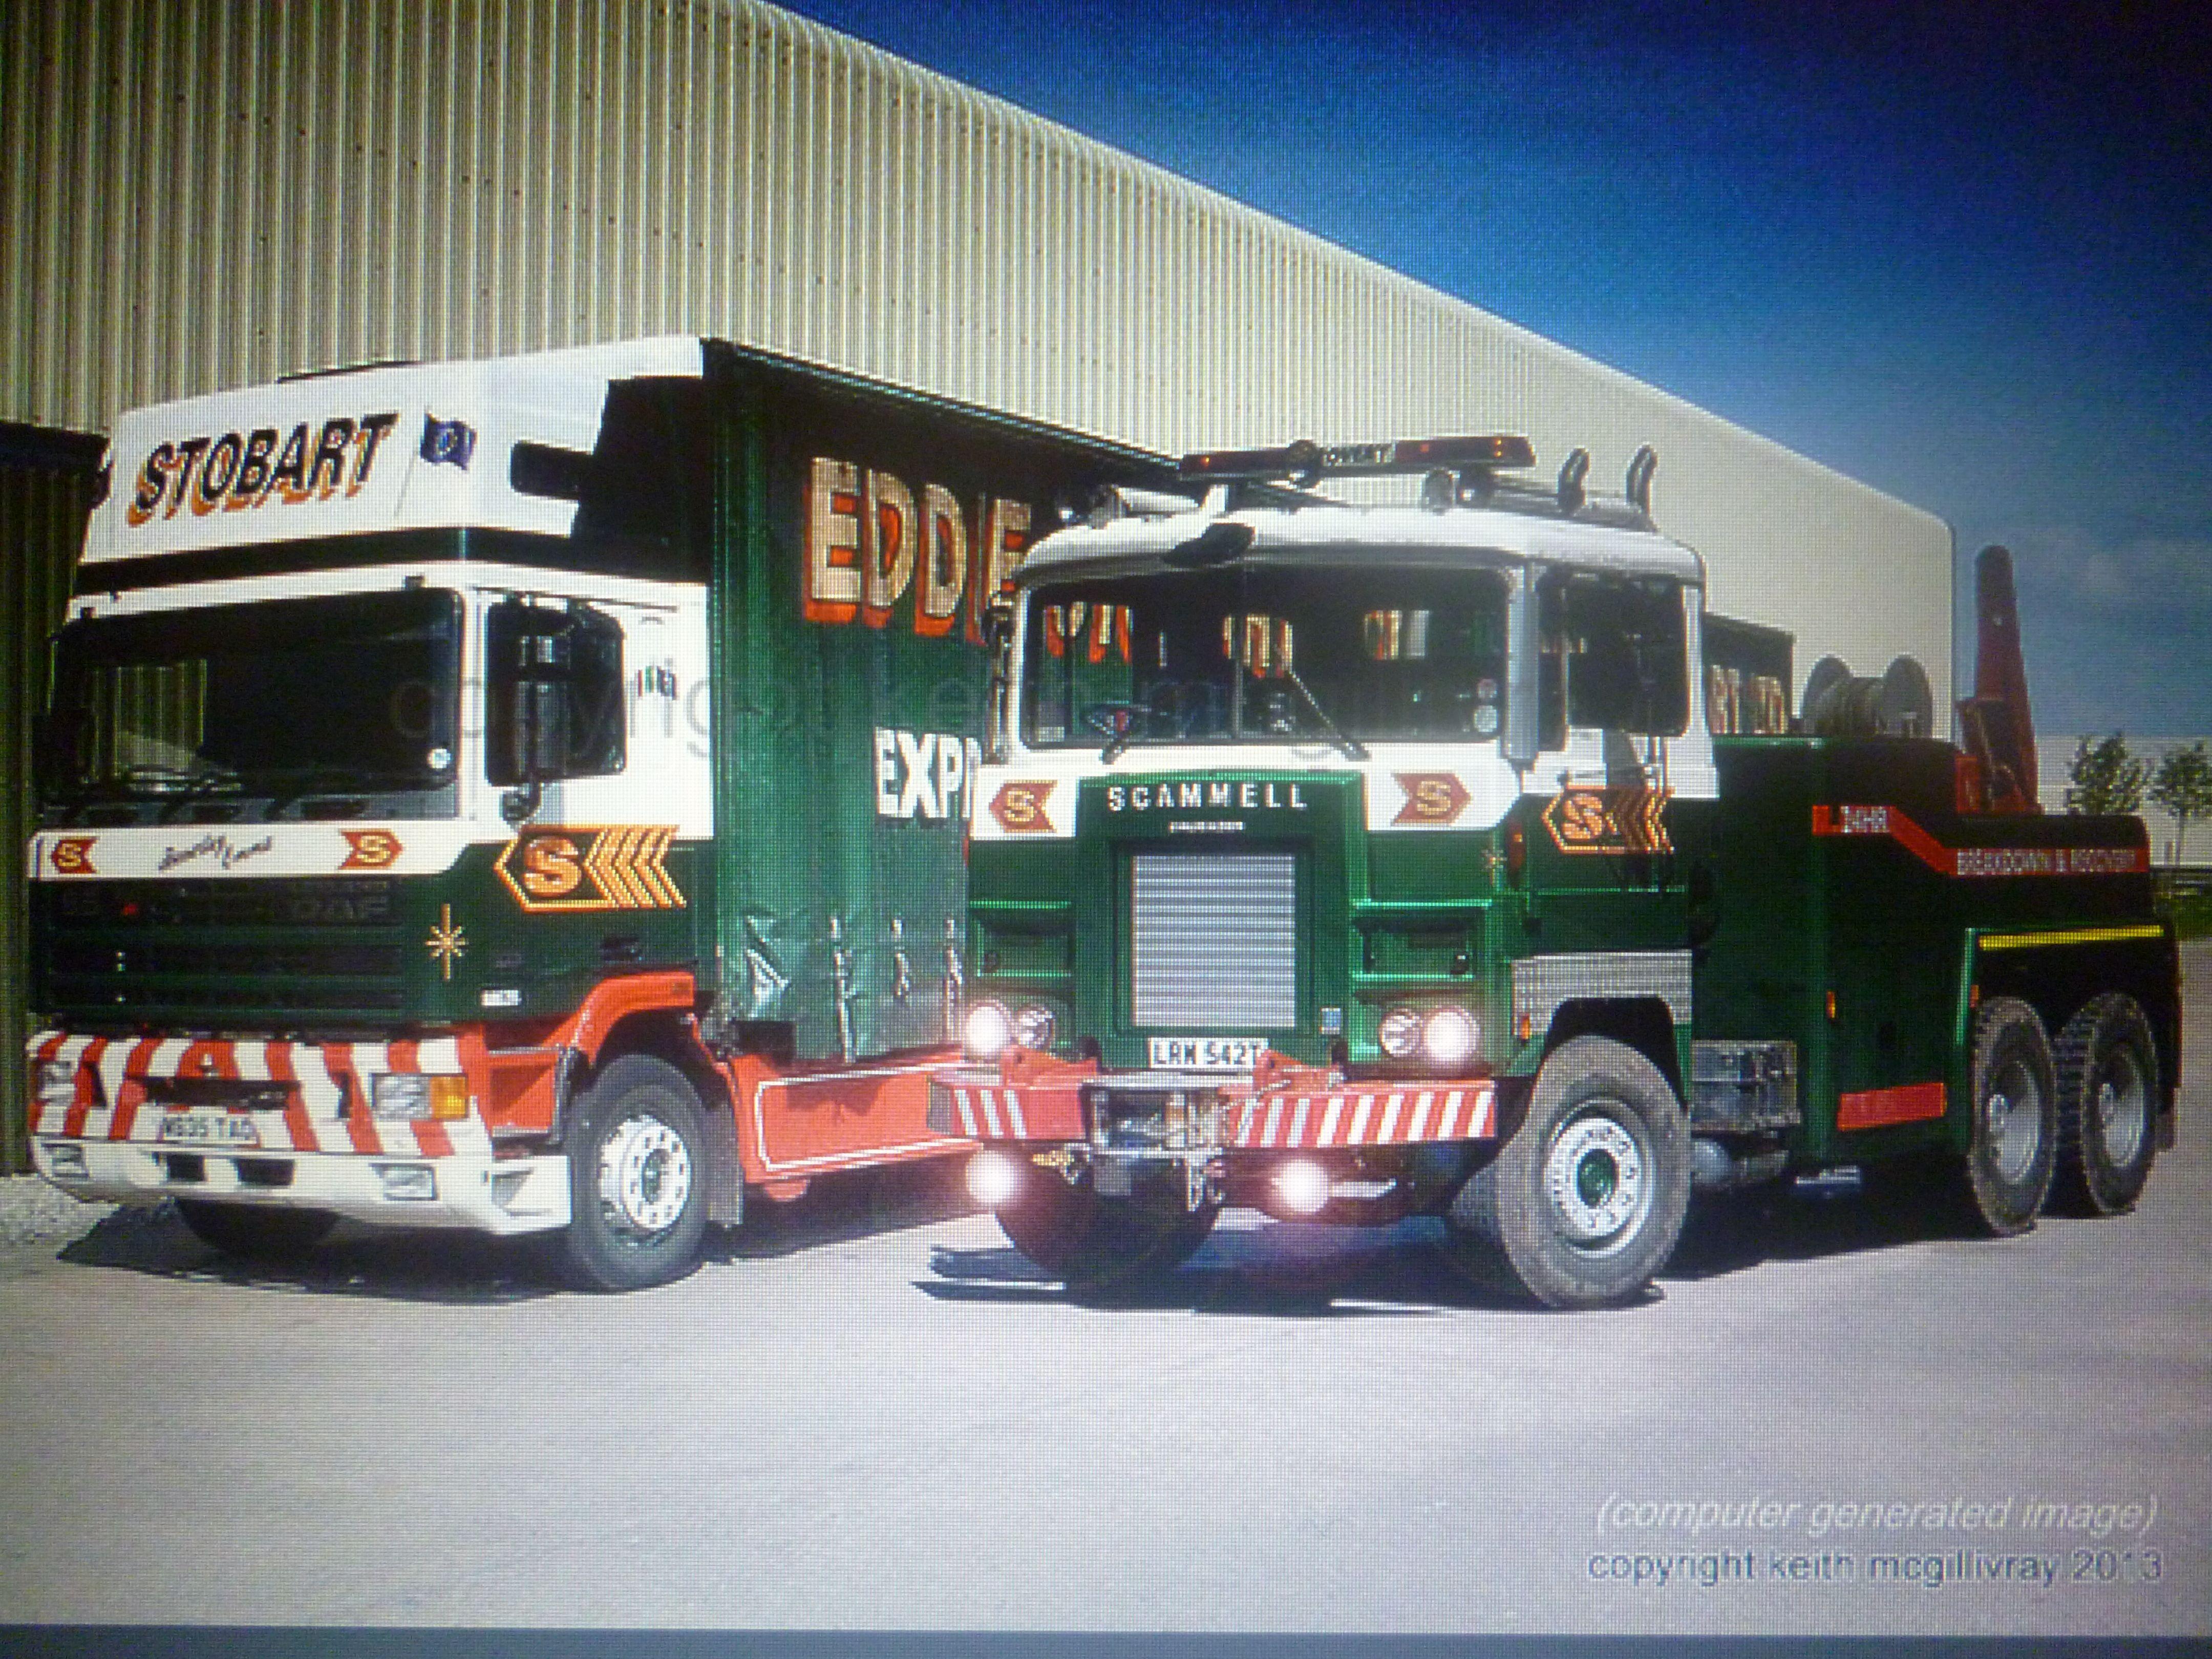 Old eddie stobart trucks